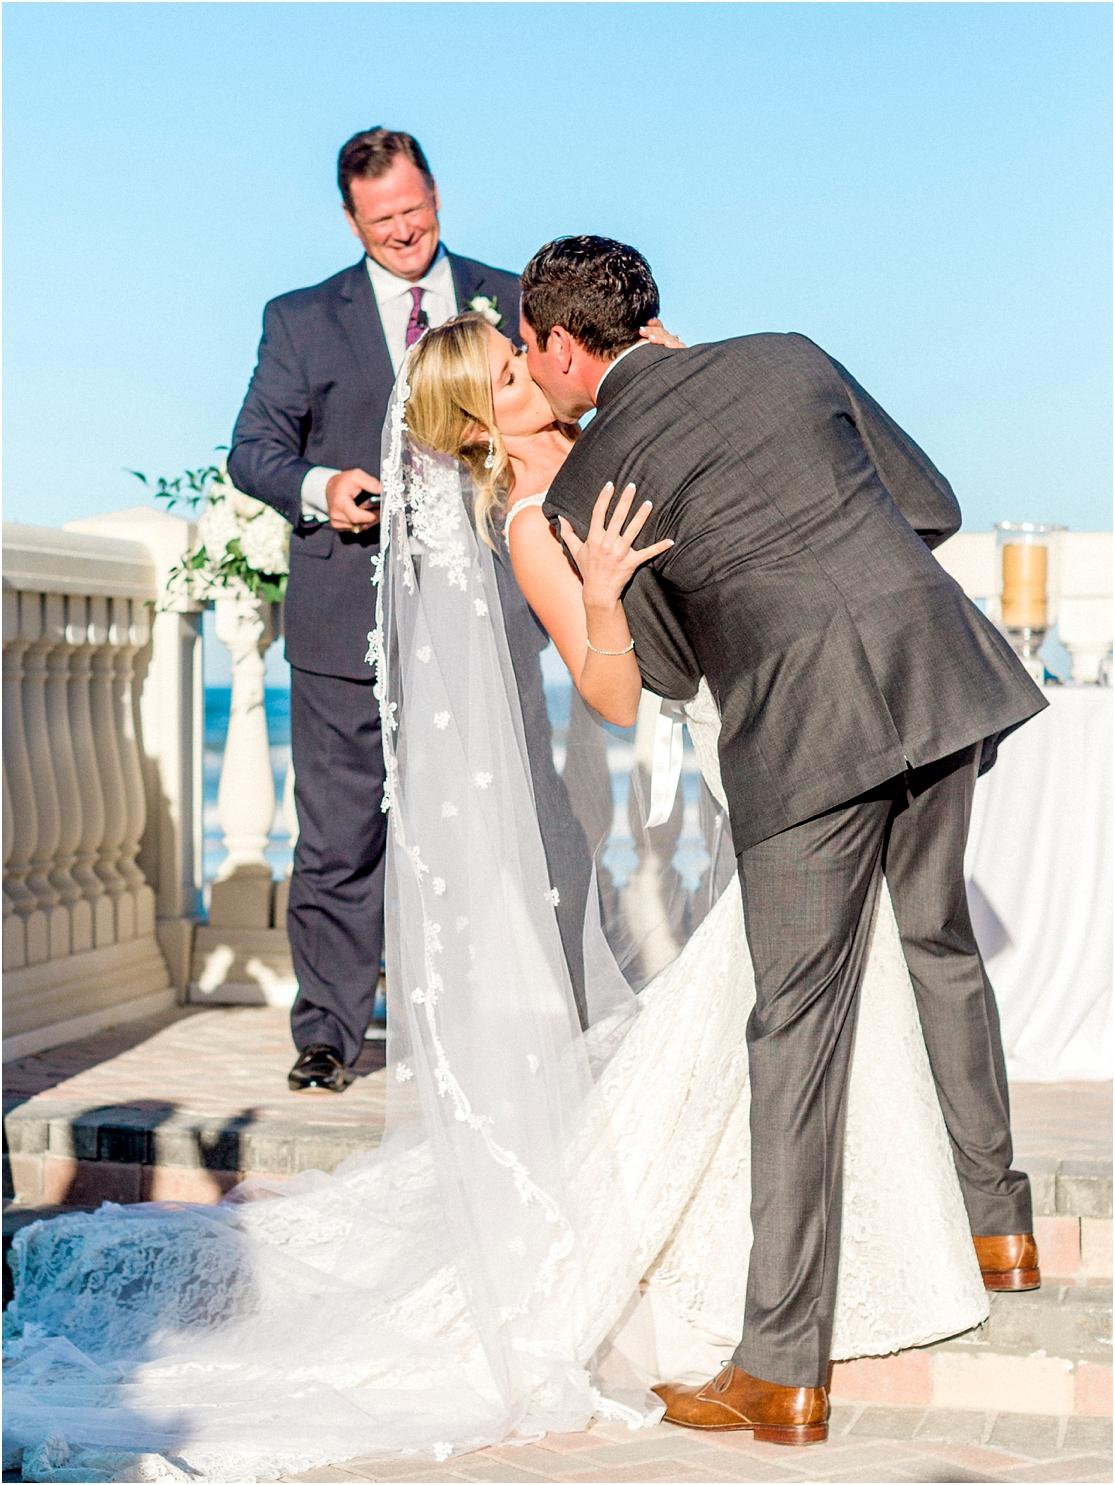 Lisa Silva Photography- Ponte Vedra Beach and Jacksonville, Florida Fine Art Film Wedding Photography- Wedding at the Ponte Vedra Inn and Club_0057.jpg